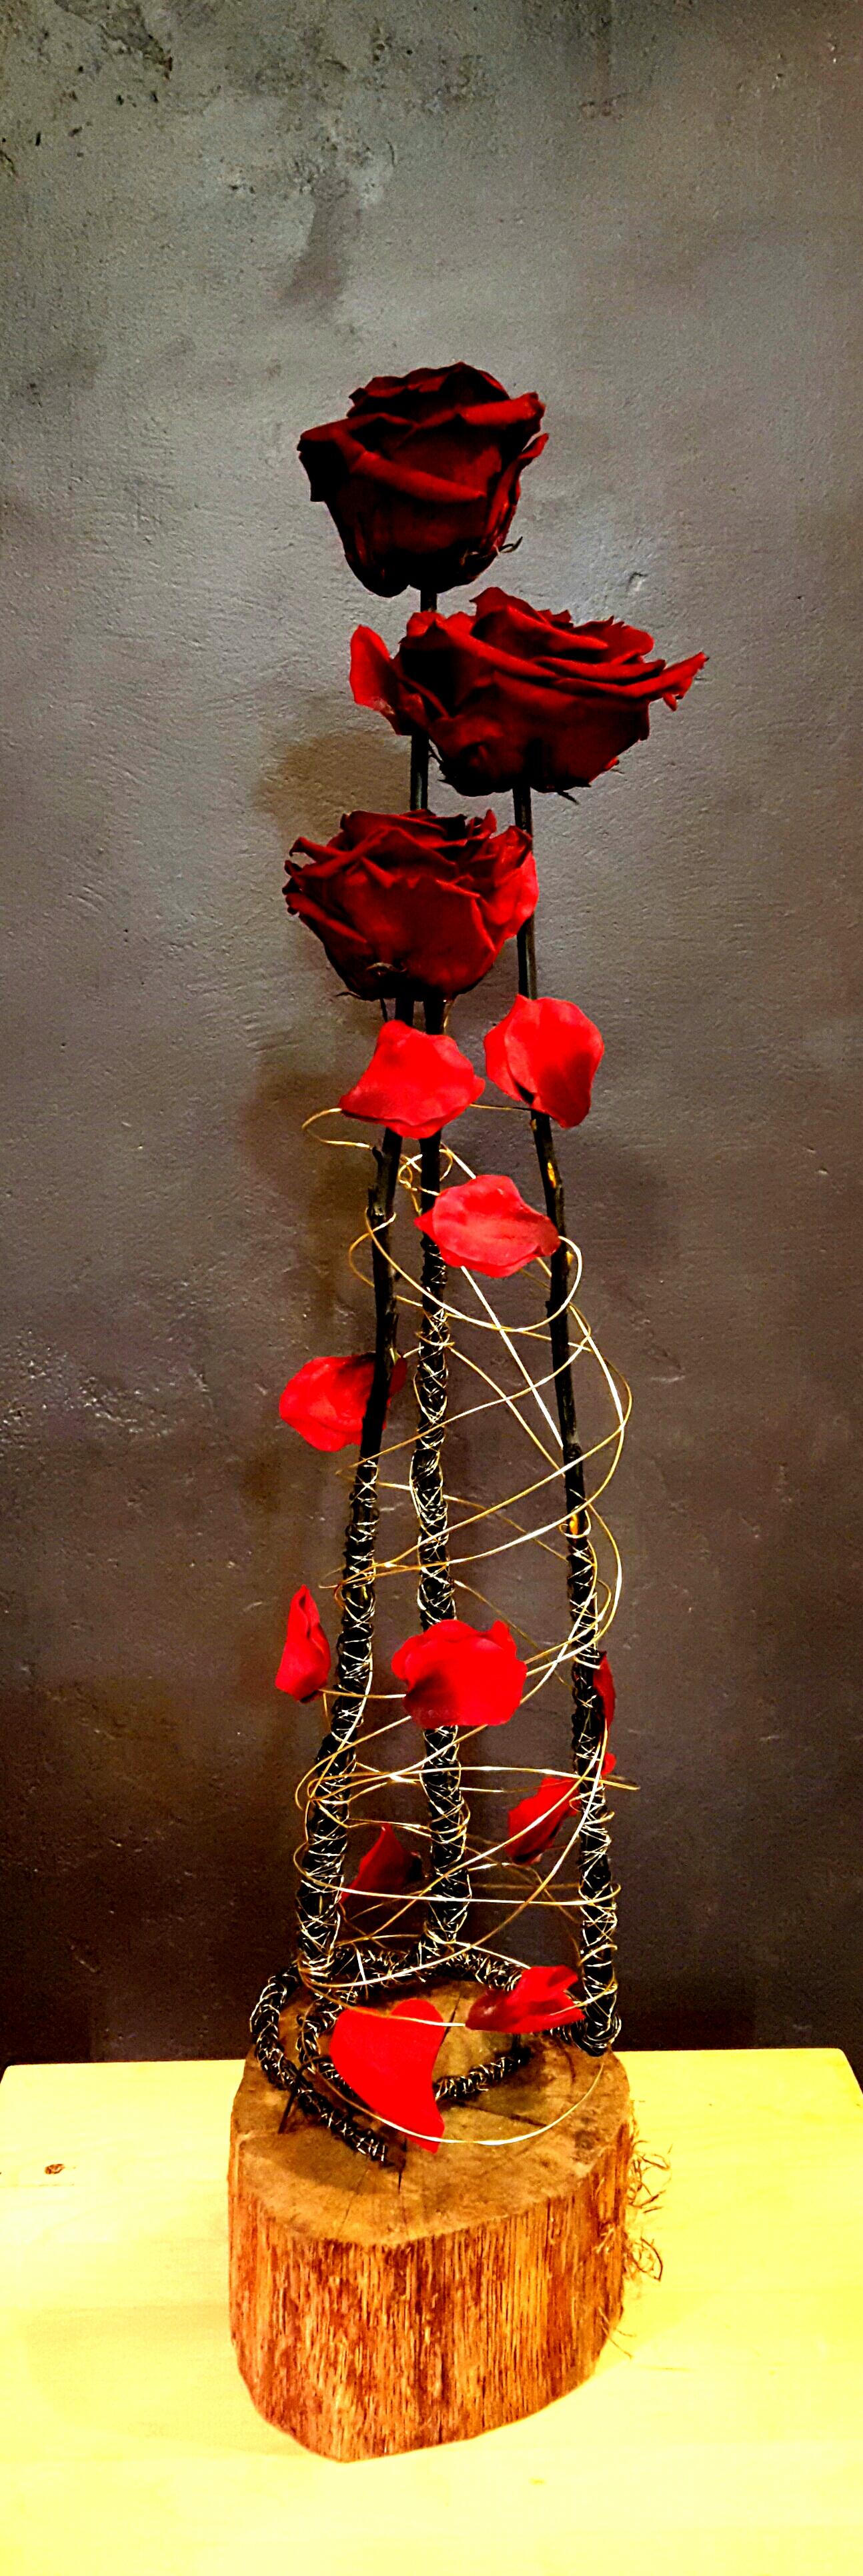 Roses Eternelles